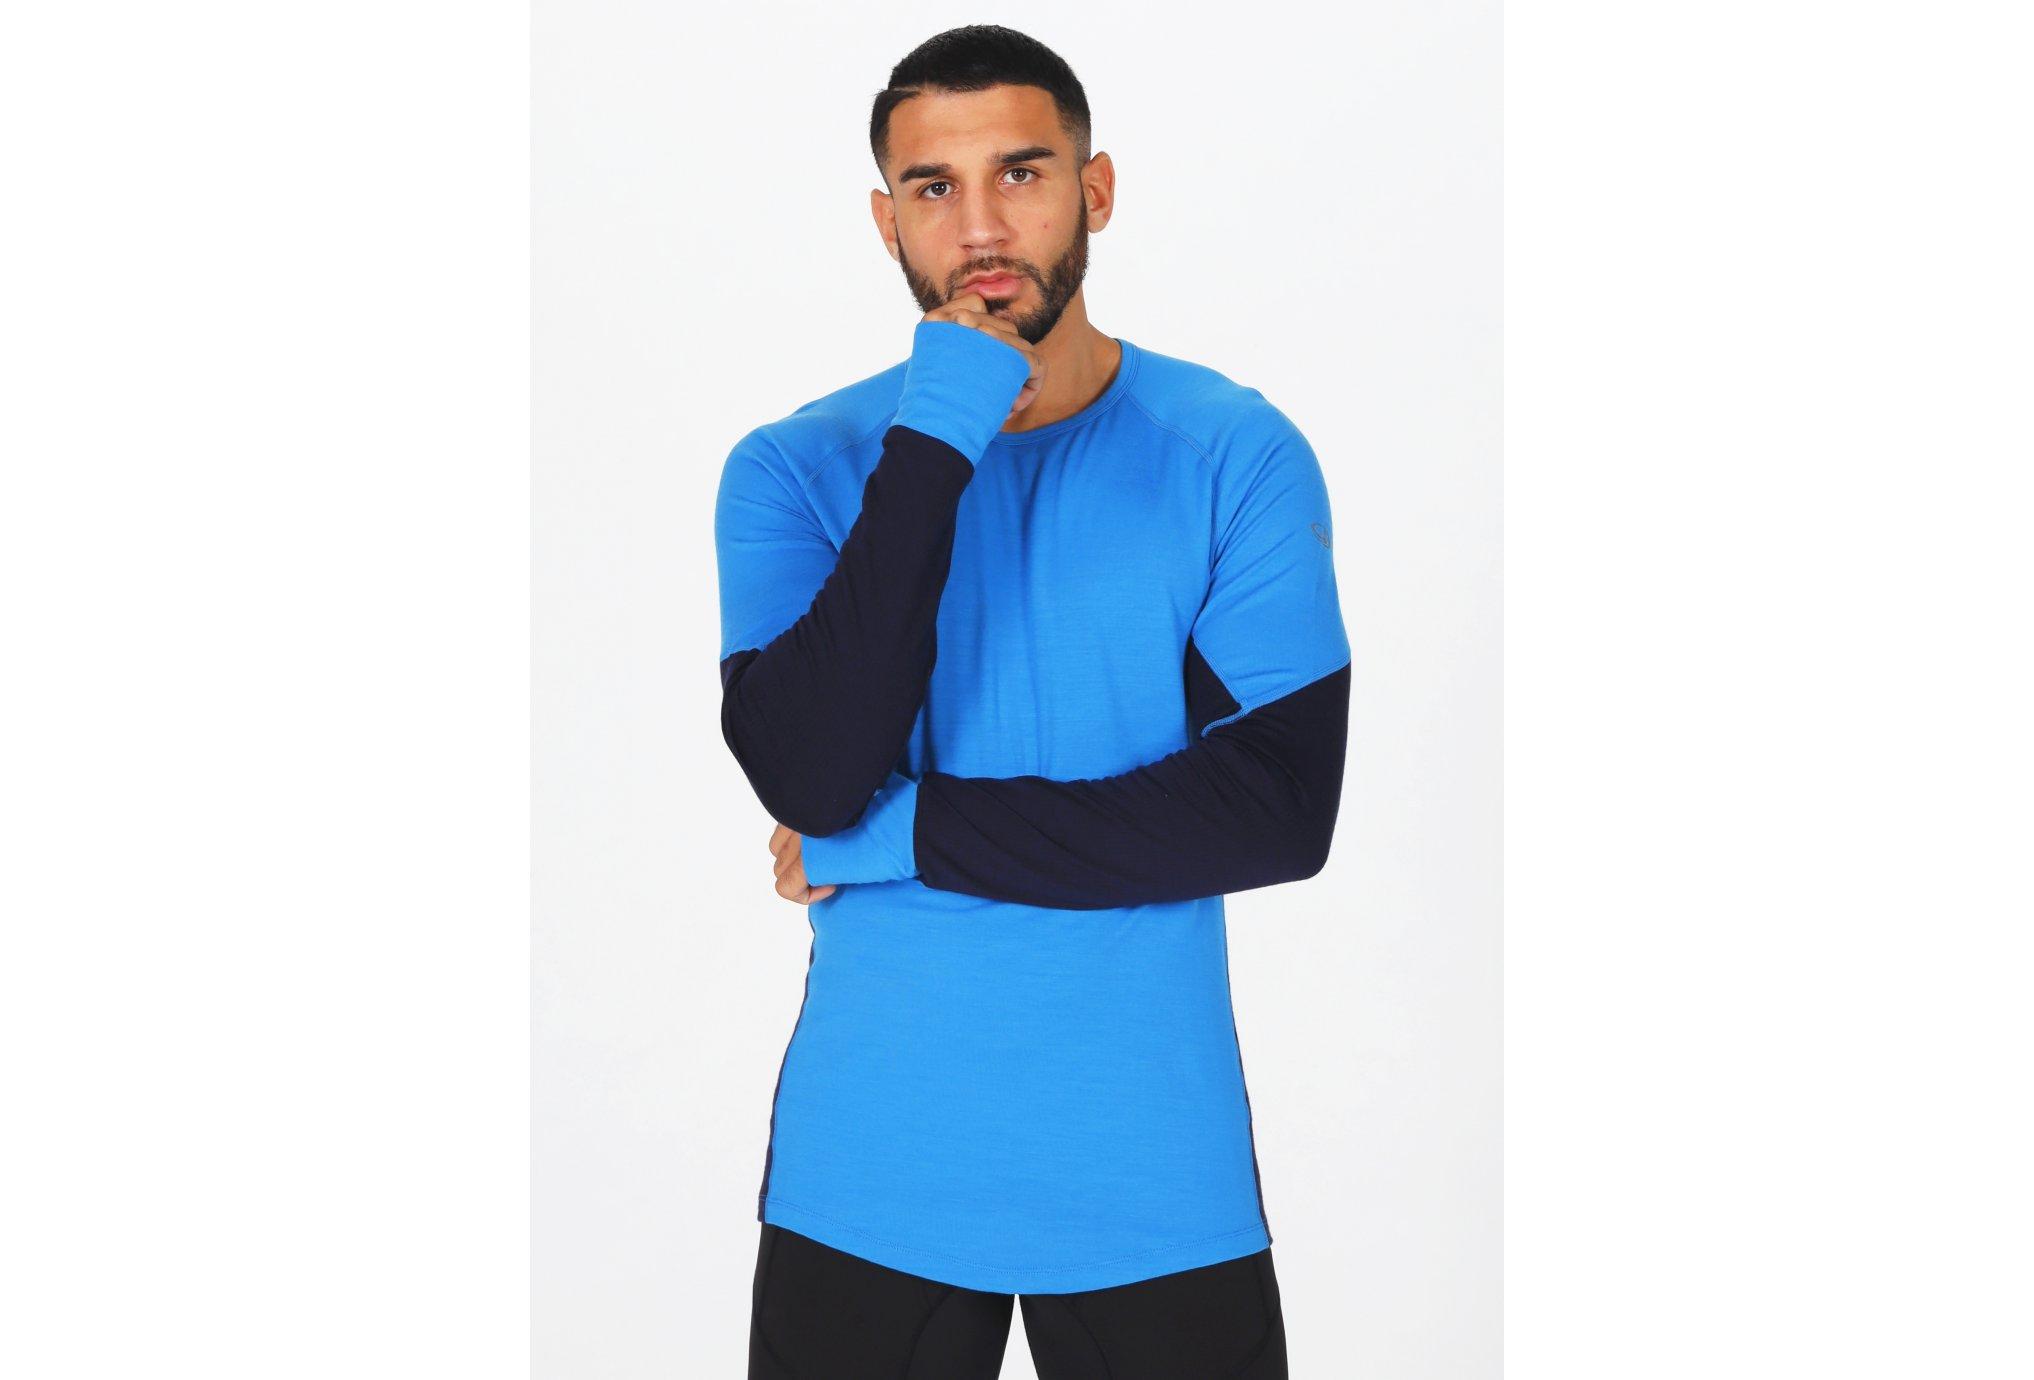 Icebreaker BodyfitZONE 260 Crewe M vêtement running homme